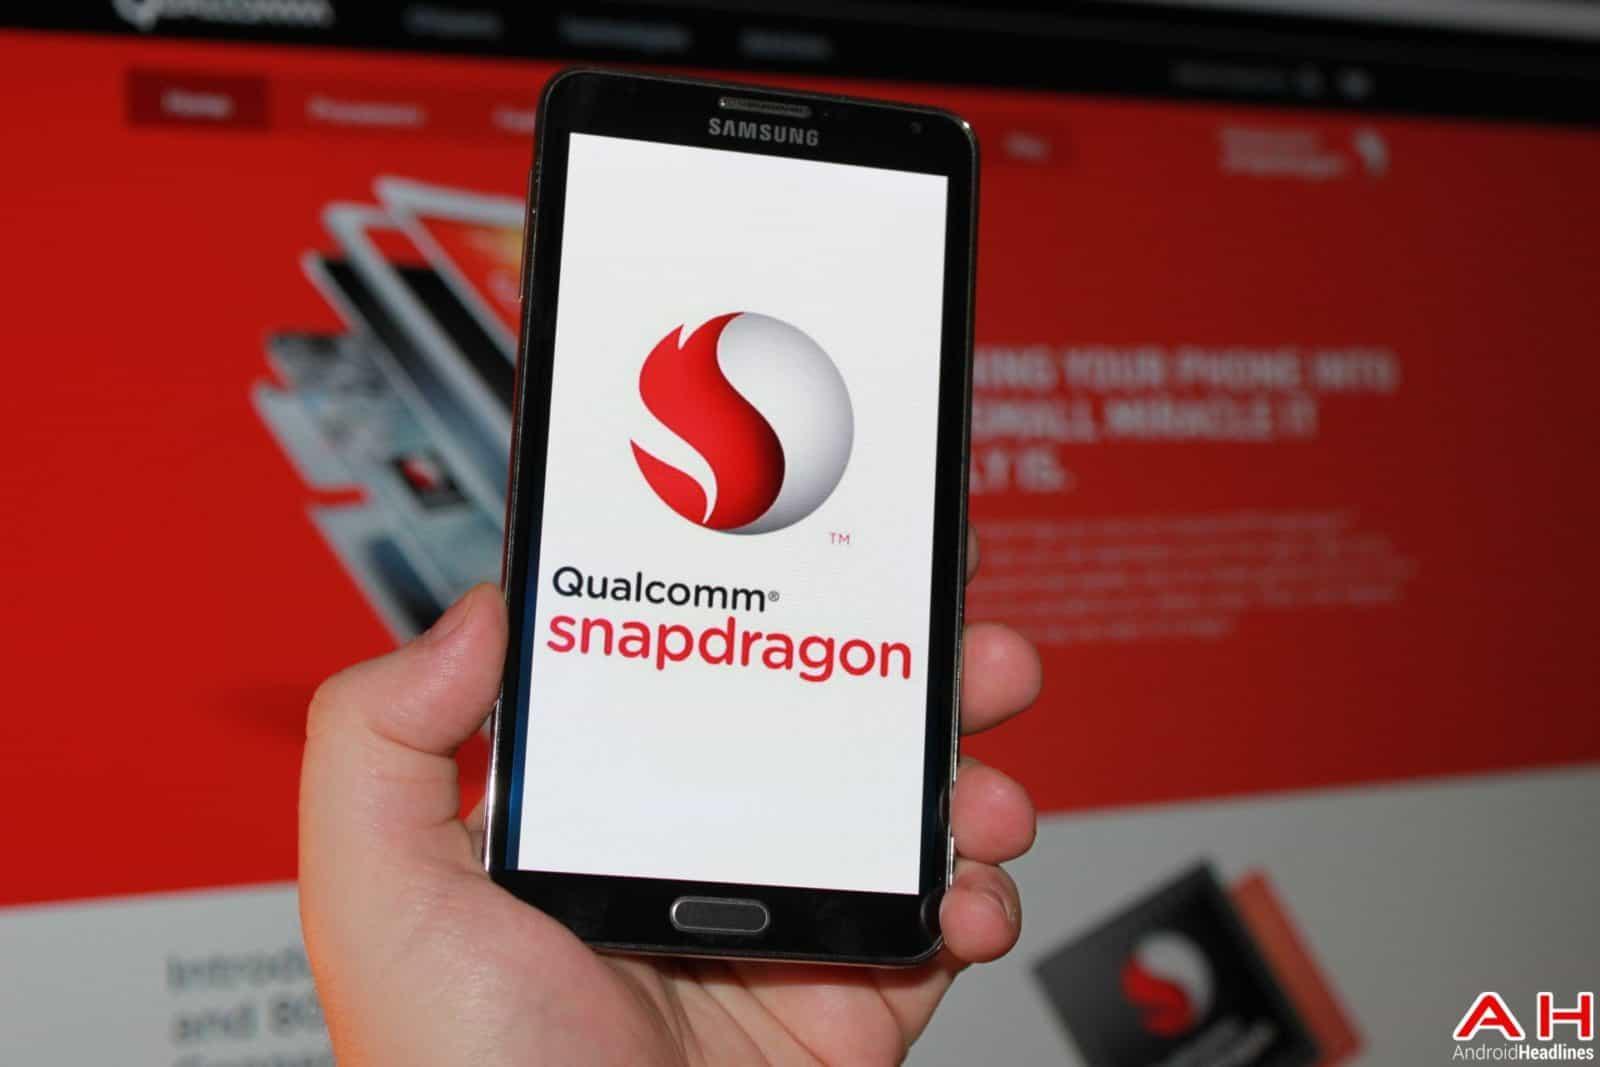 AH SnapDragon Qualcomm 1.9